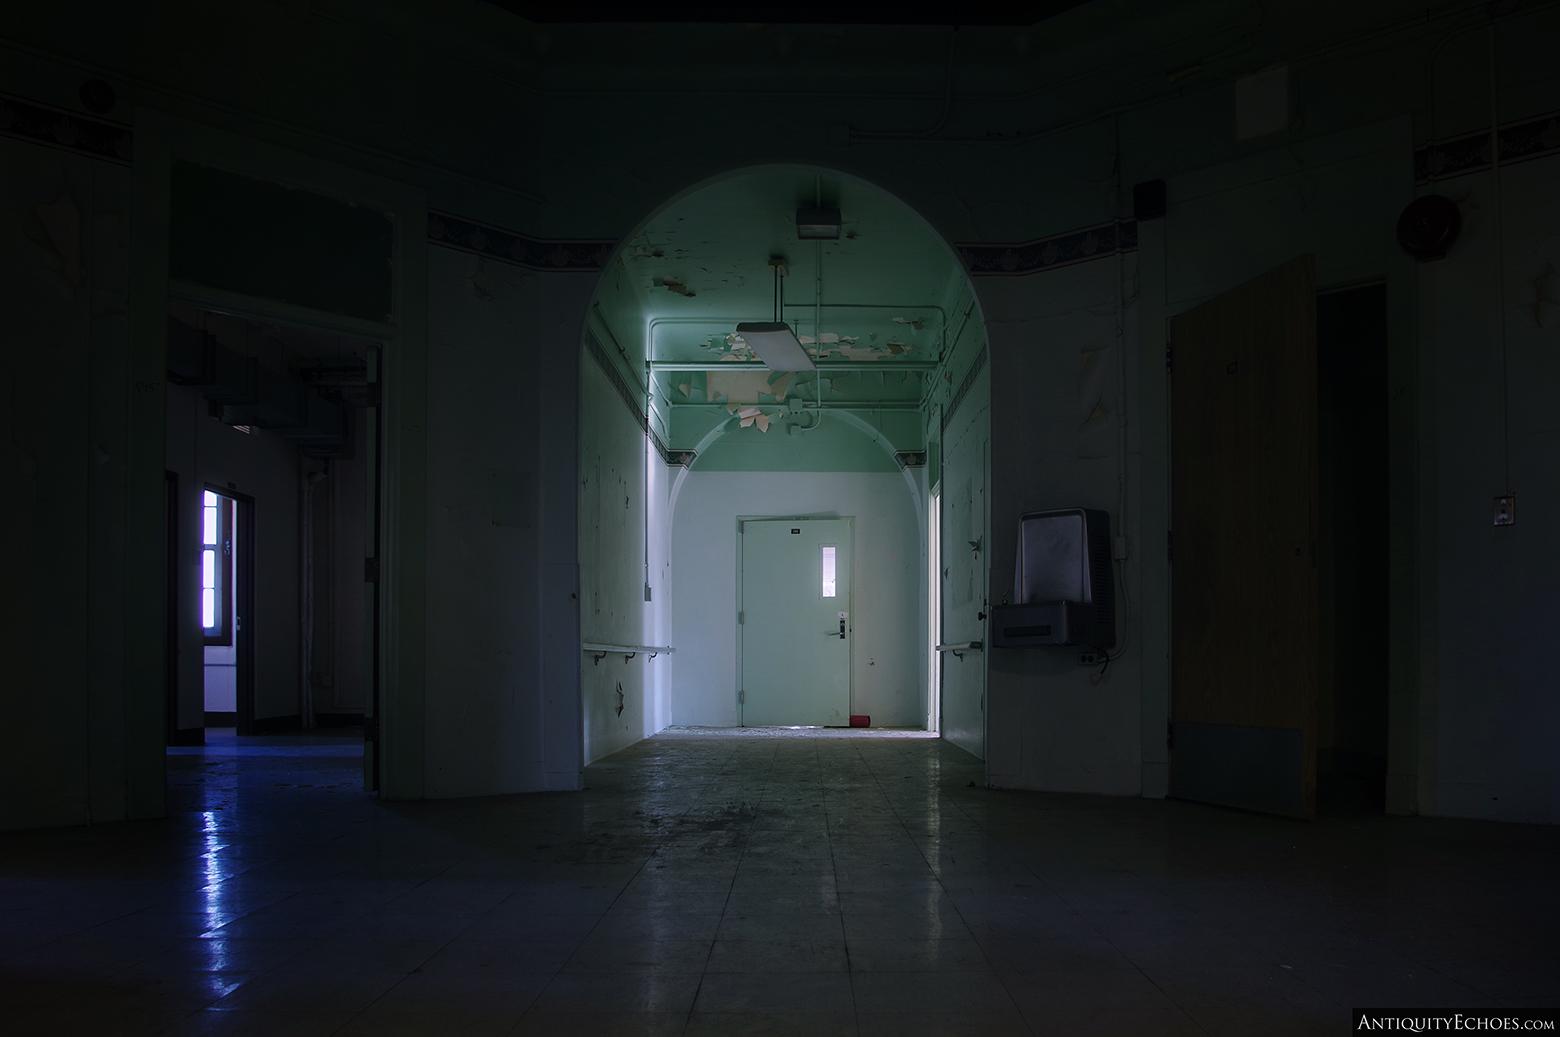 Allentown State Hospital  - Ward Junction